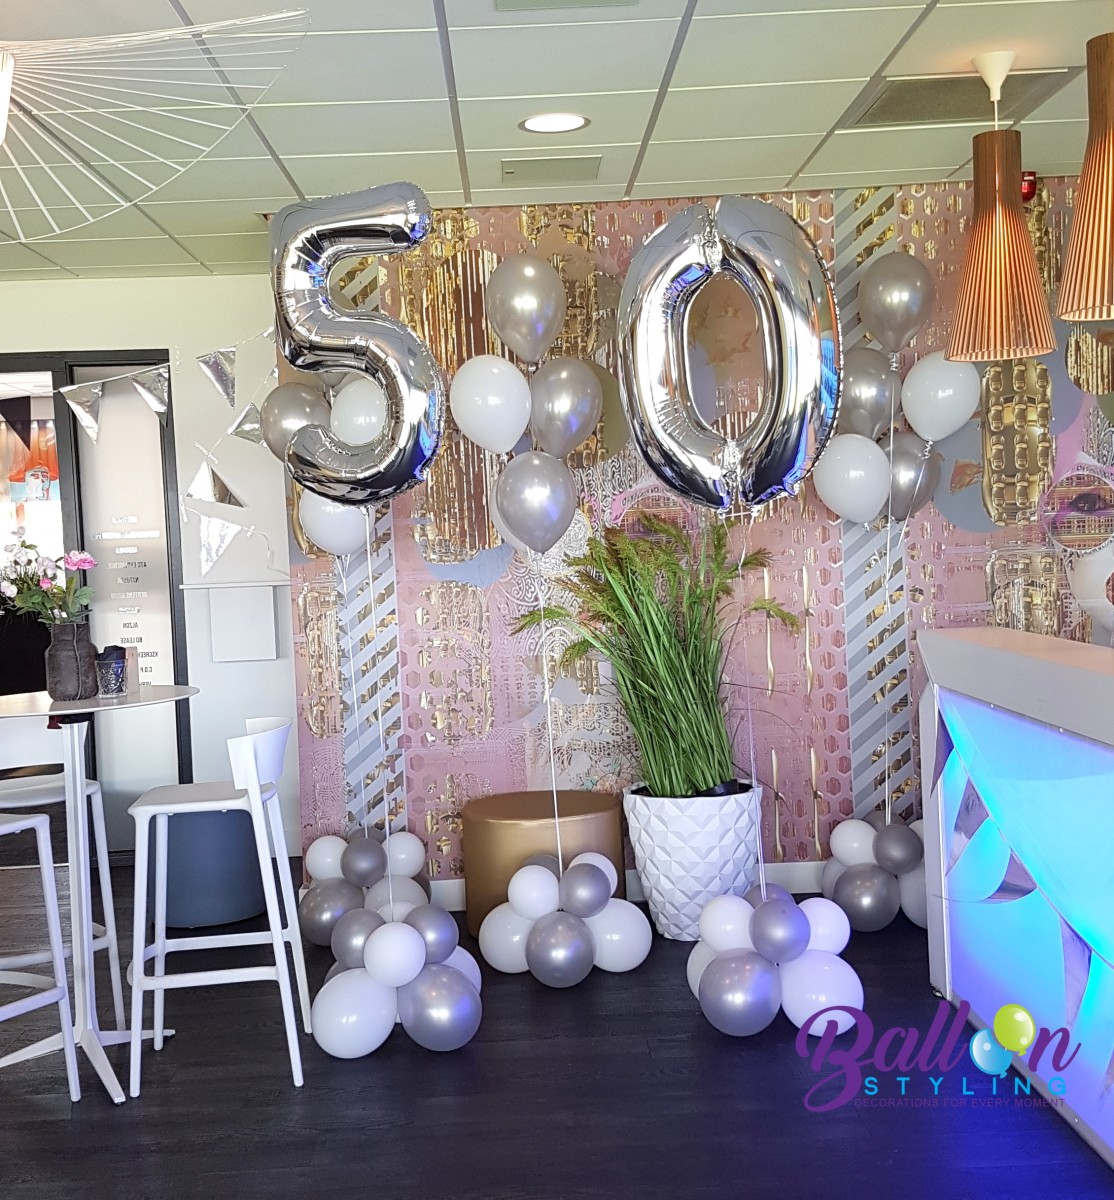 Balloon Styling Tilburg trossen heliumballonnen gronddecoratie cijferballonnen 50 jaar verjaardag